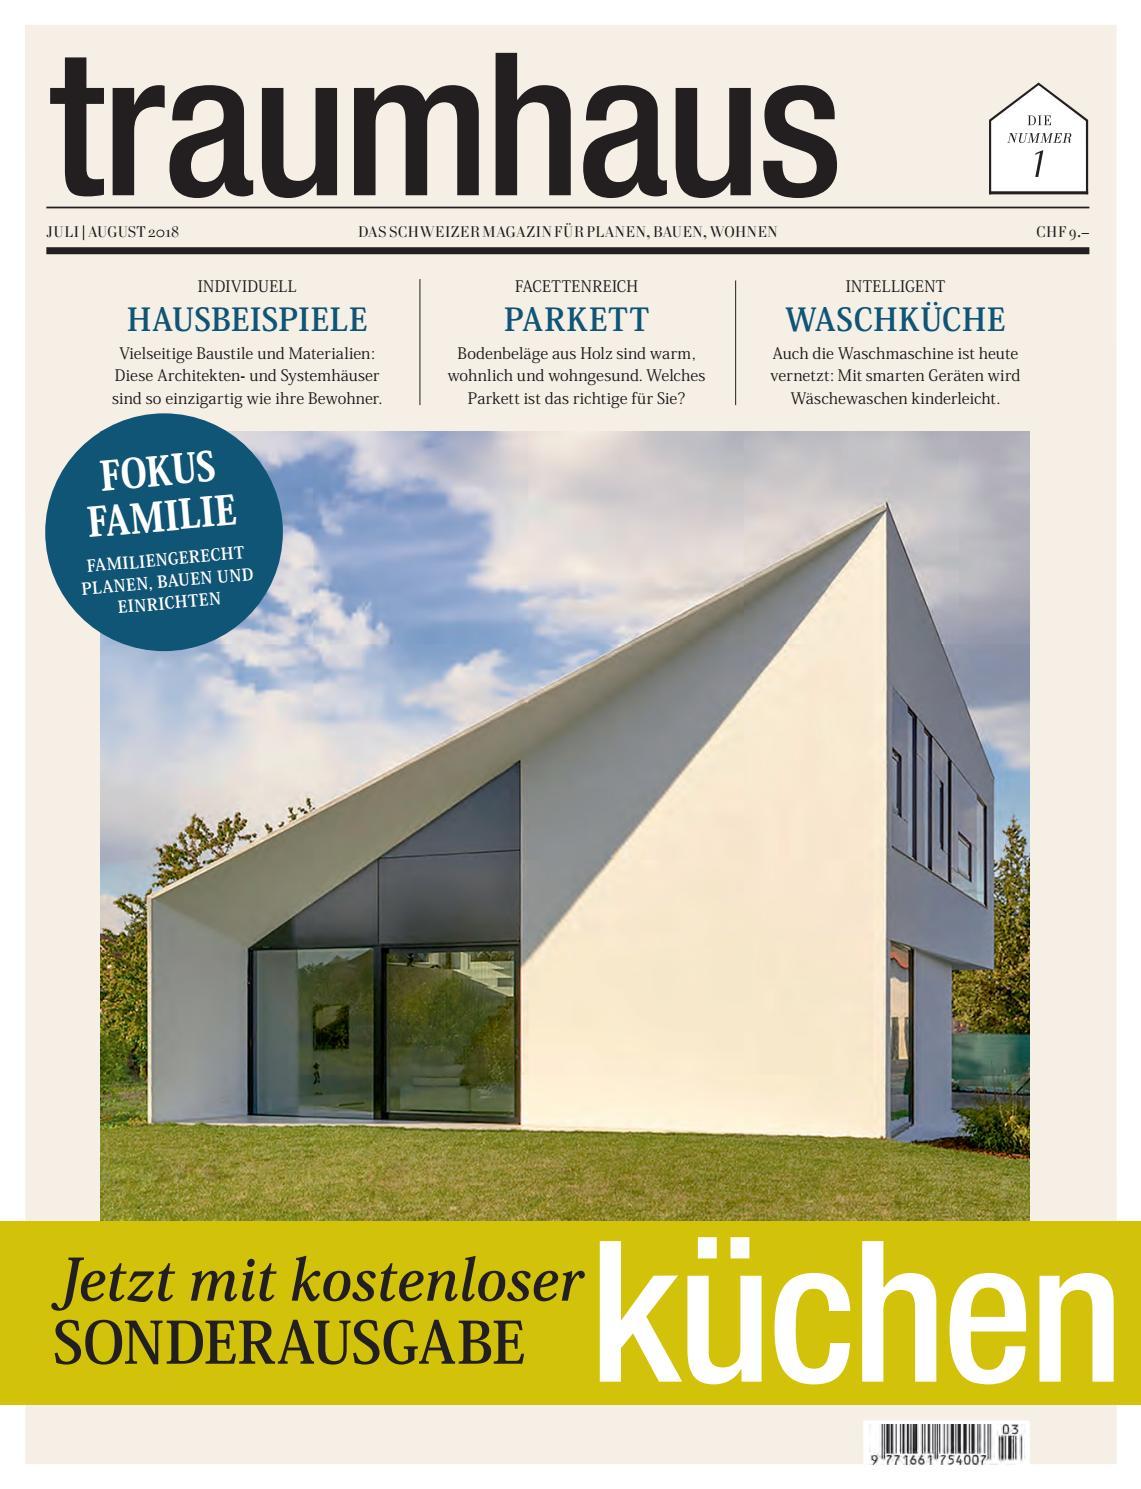 Traumhaus 03 2018 By BL Verlag AG   Issuu